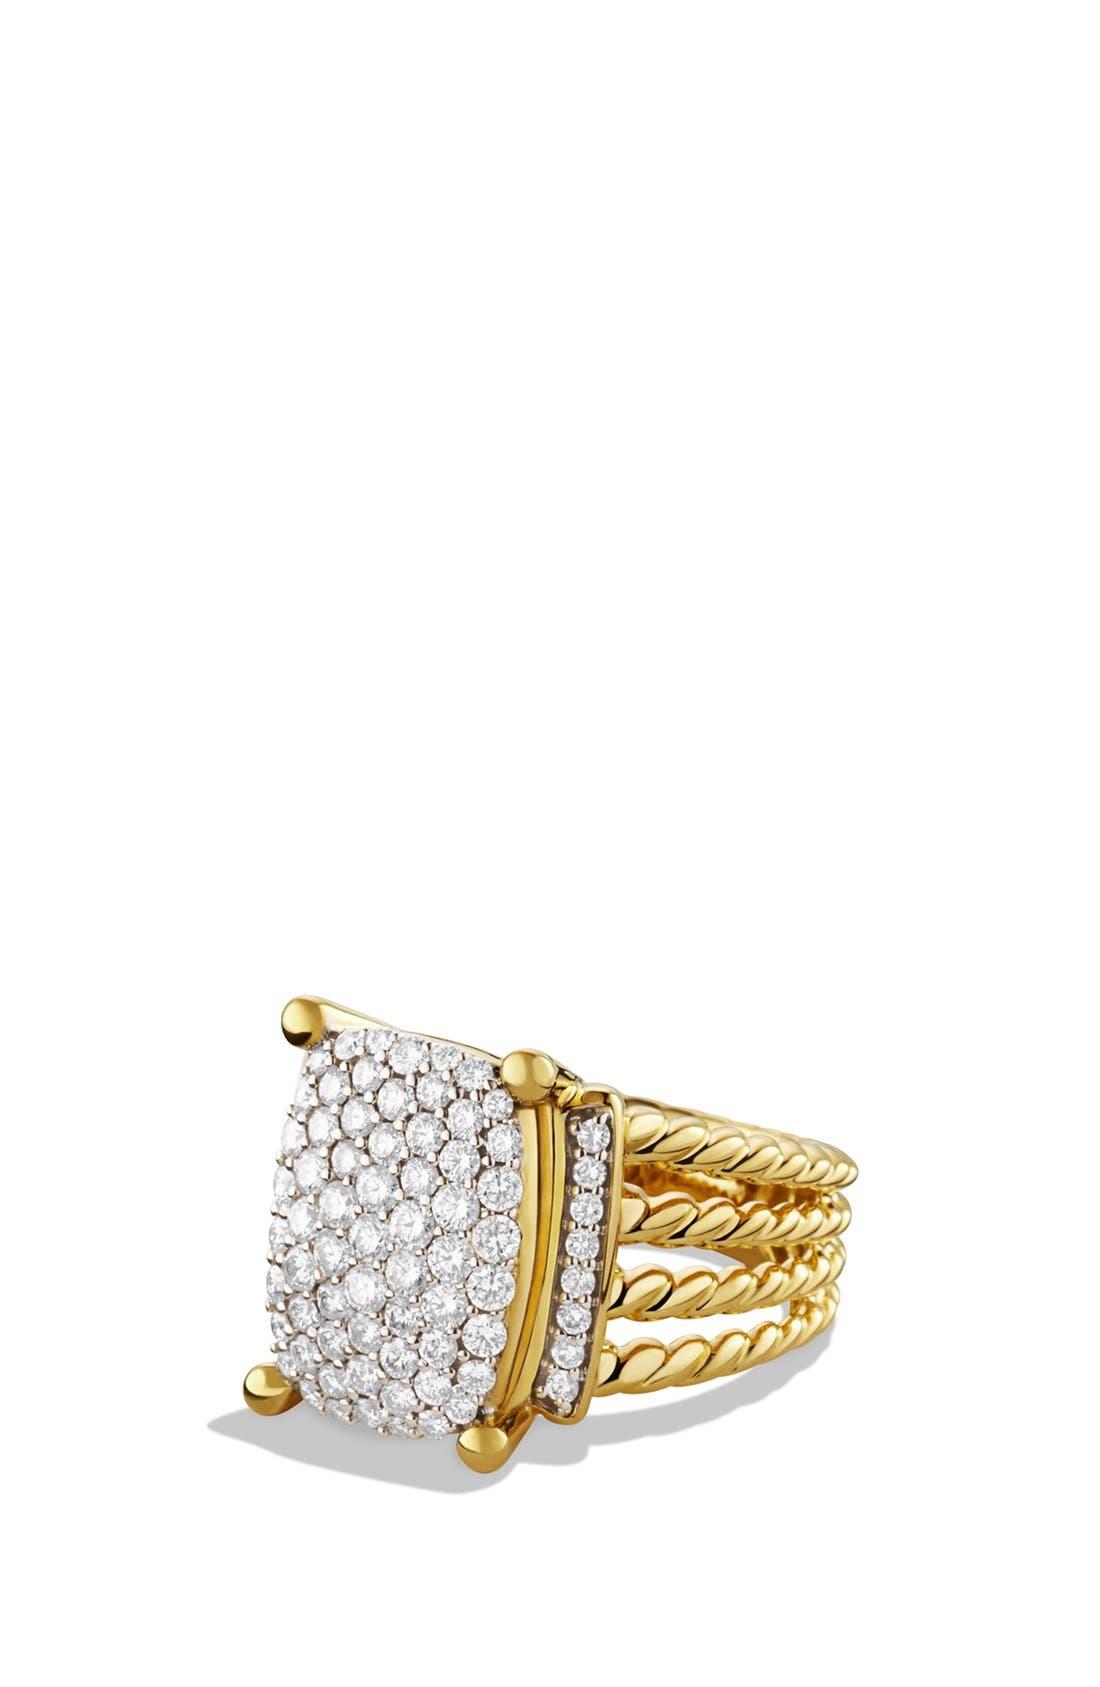 Alternate Image 1 Selected - David Yurman 'Wheaton' Ring with Diamonds in Gold